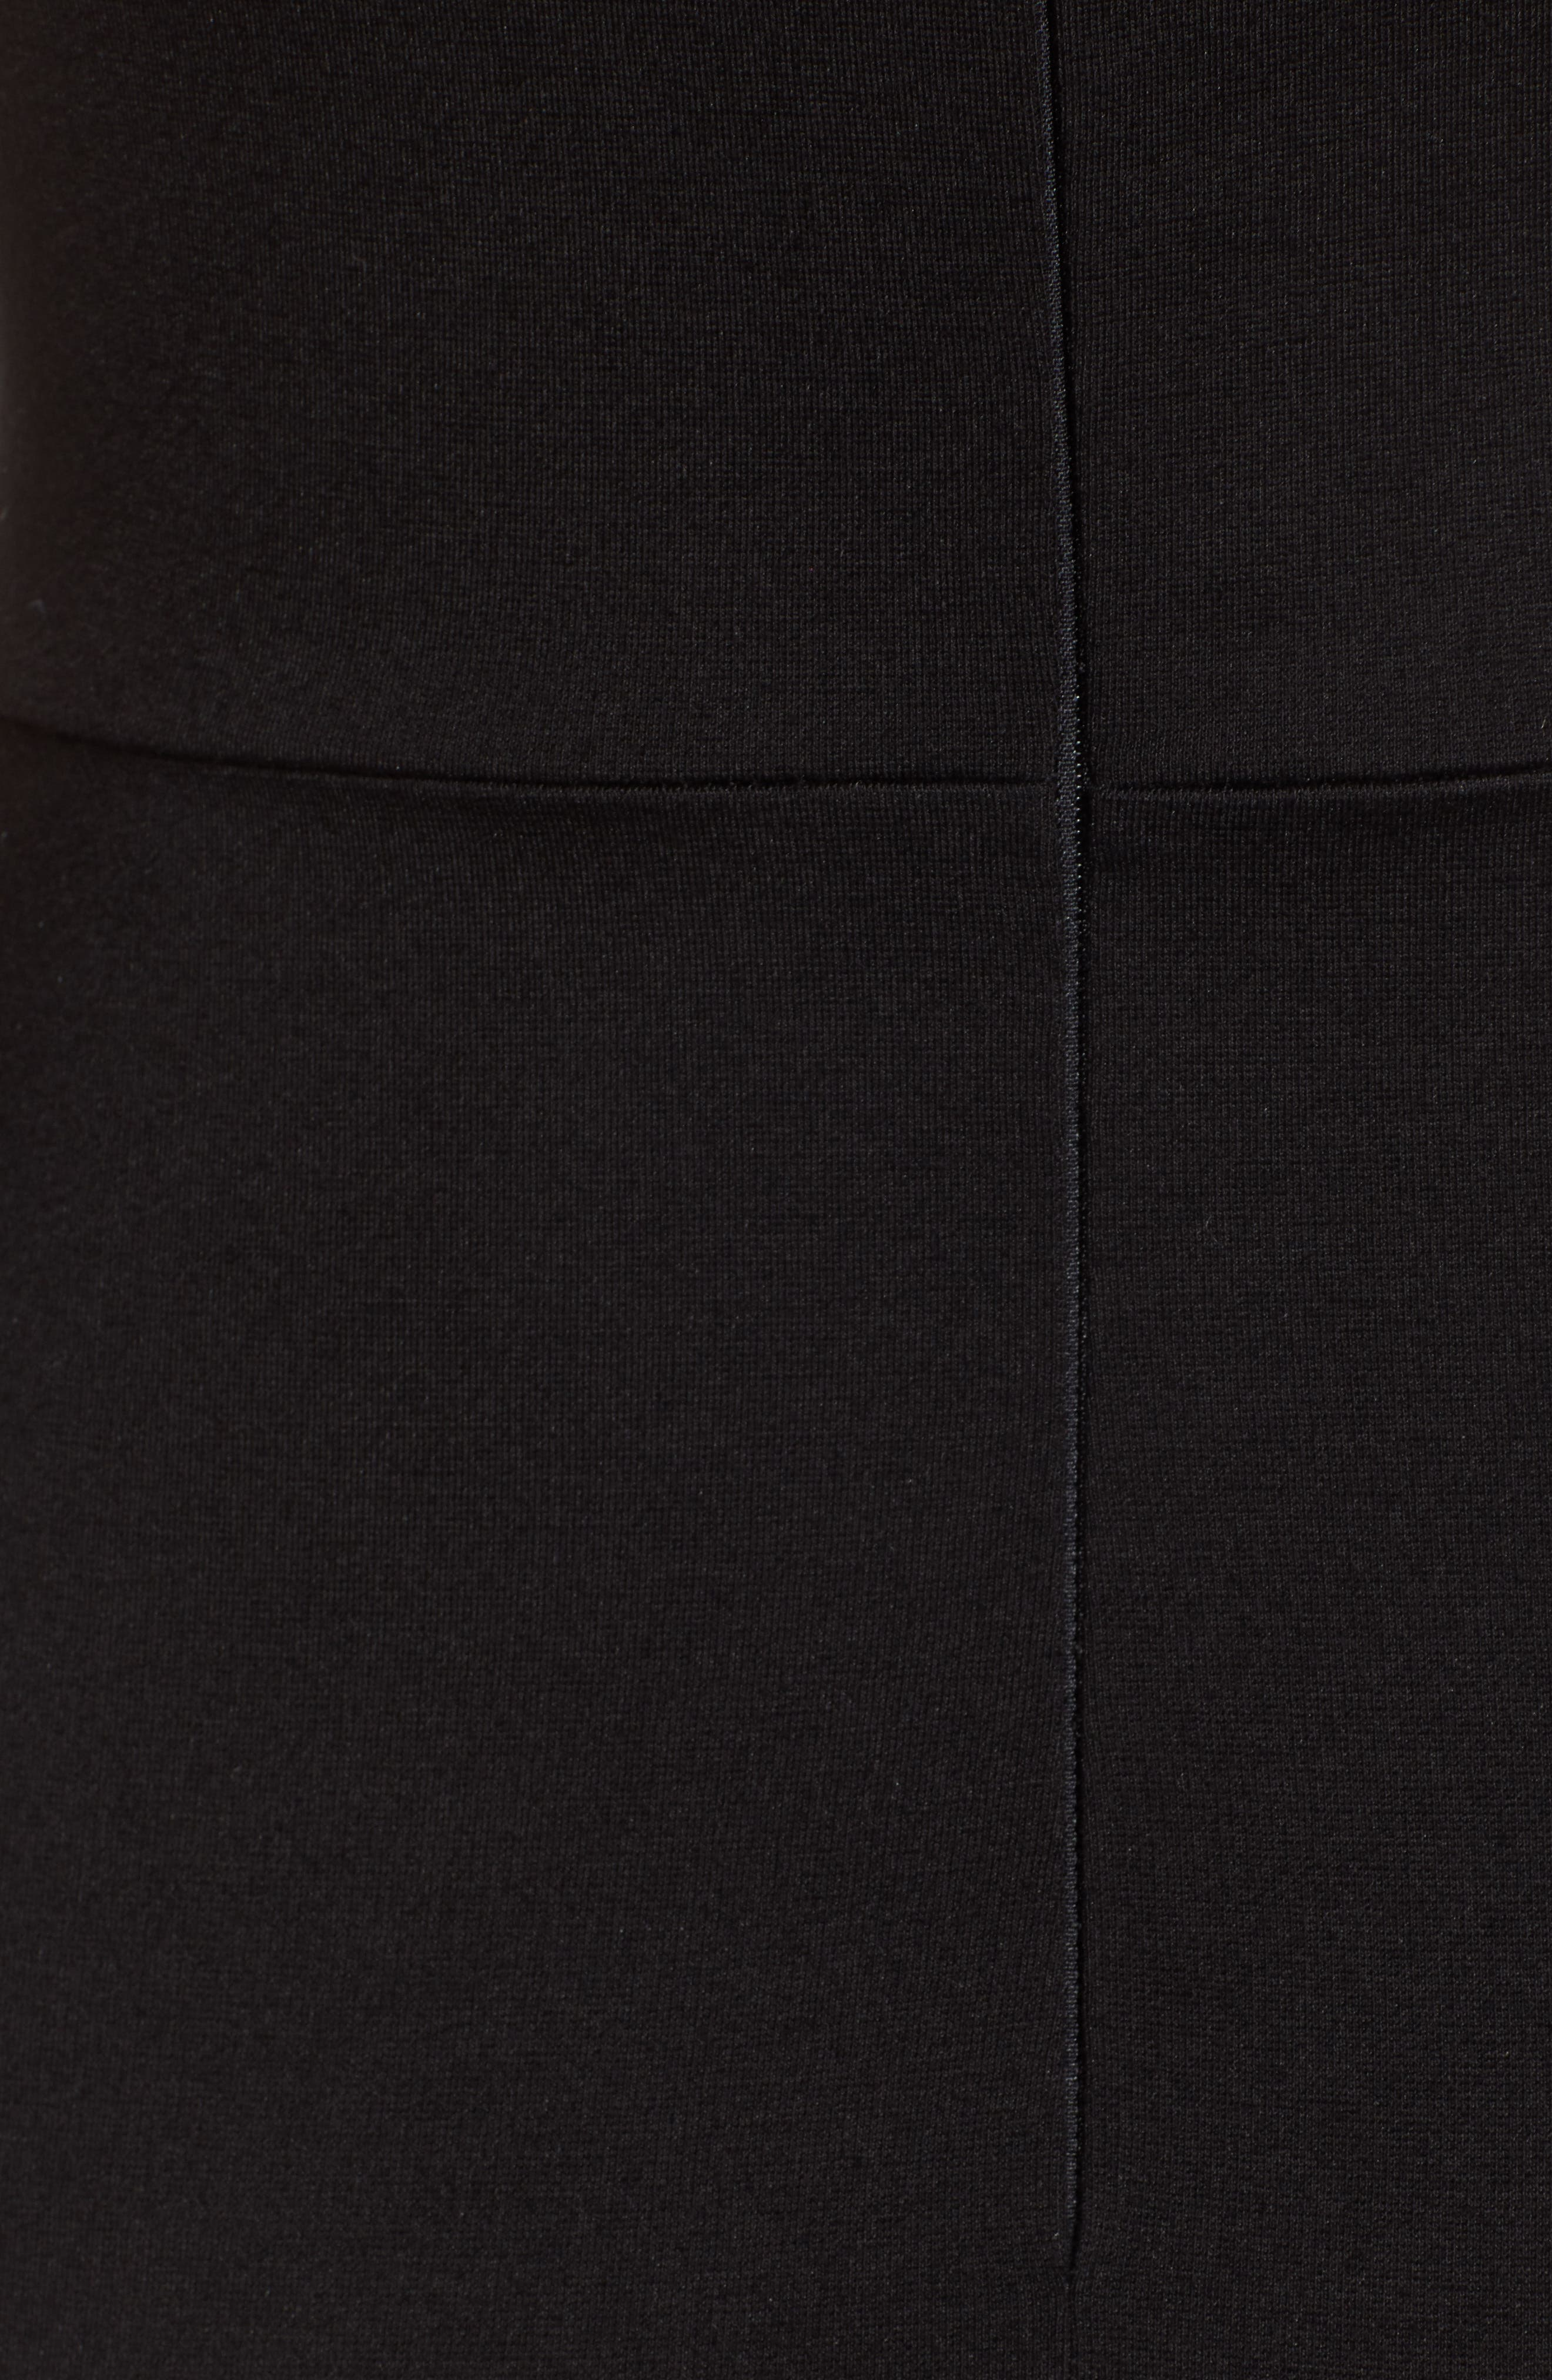 Body-Con Dress,                             Alternate thumbnail 6, color,                             001